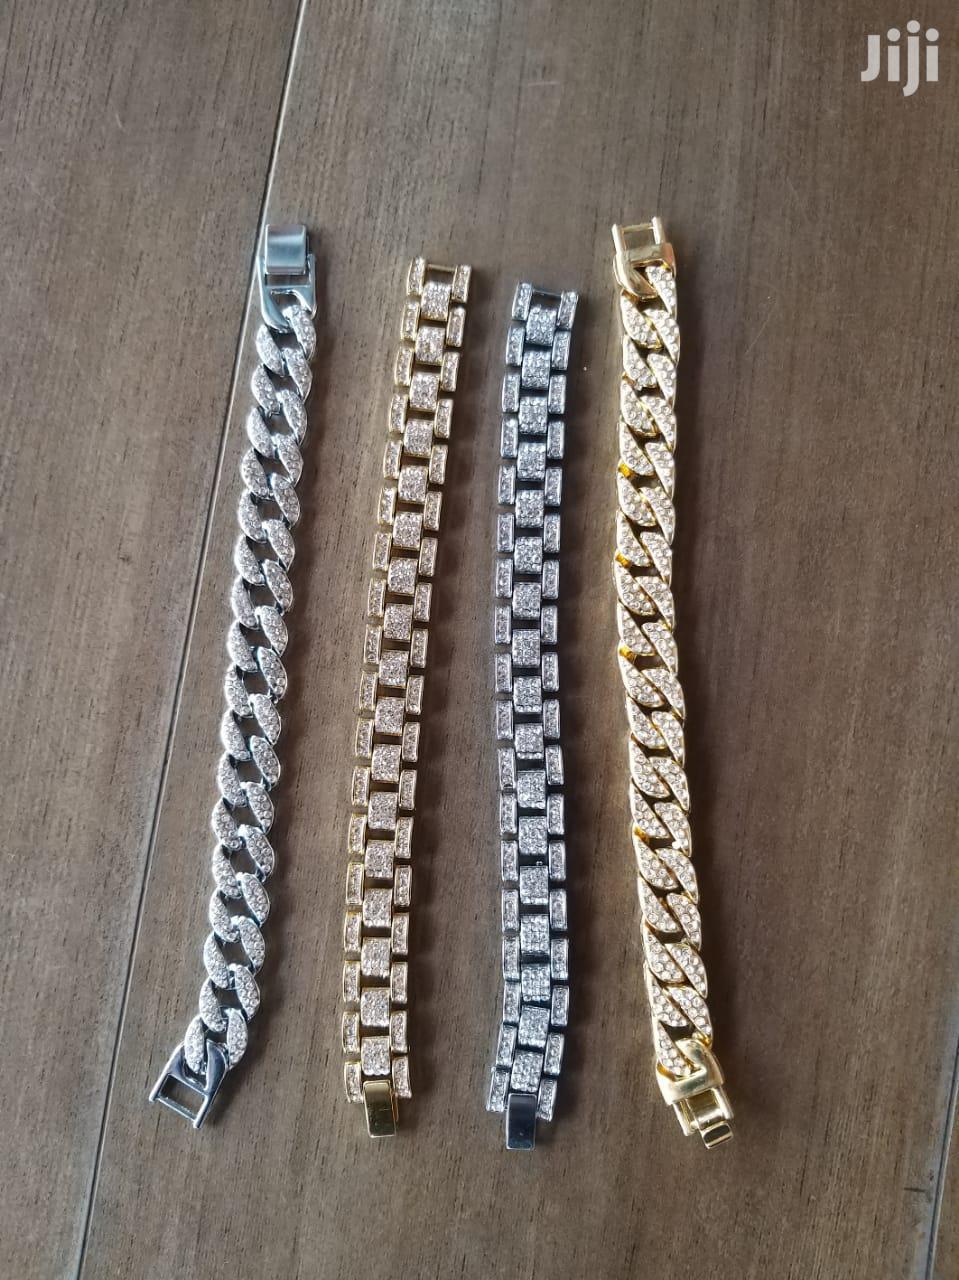 Iced Cuban Link Bracelets | Jewelry for sale in Nairobi Central, Nairobi, Kenya